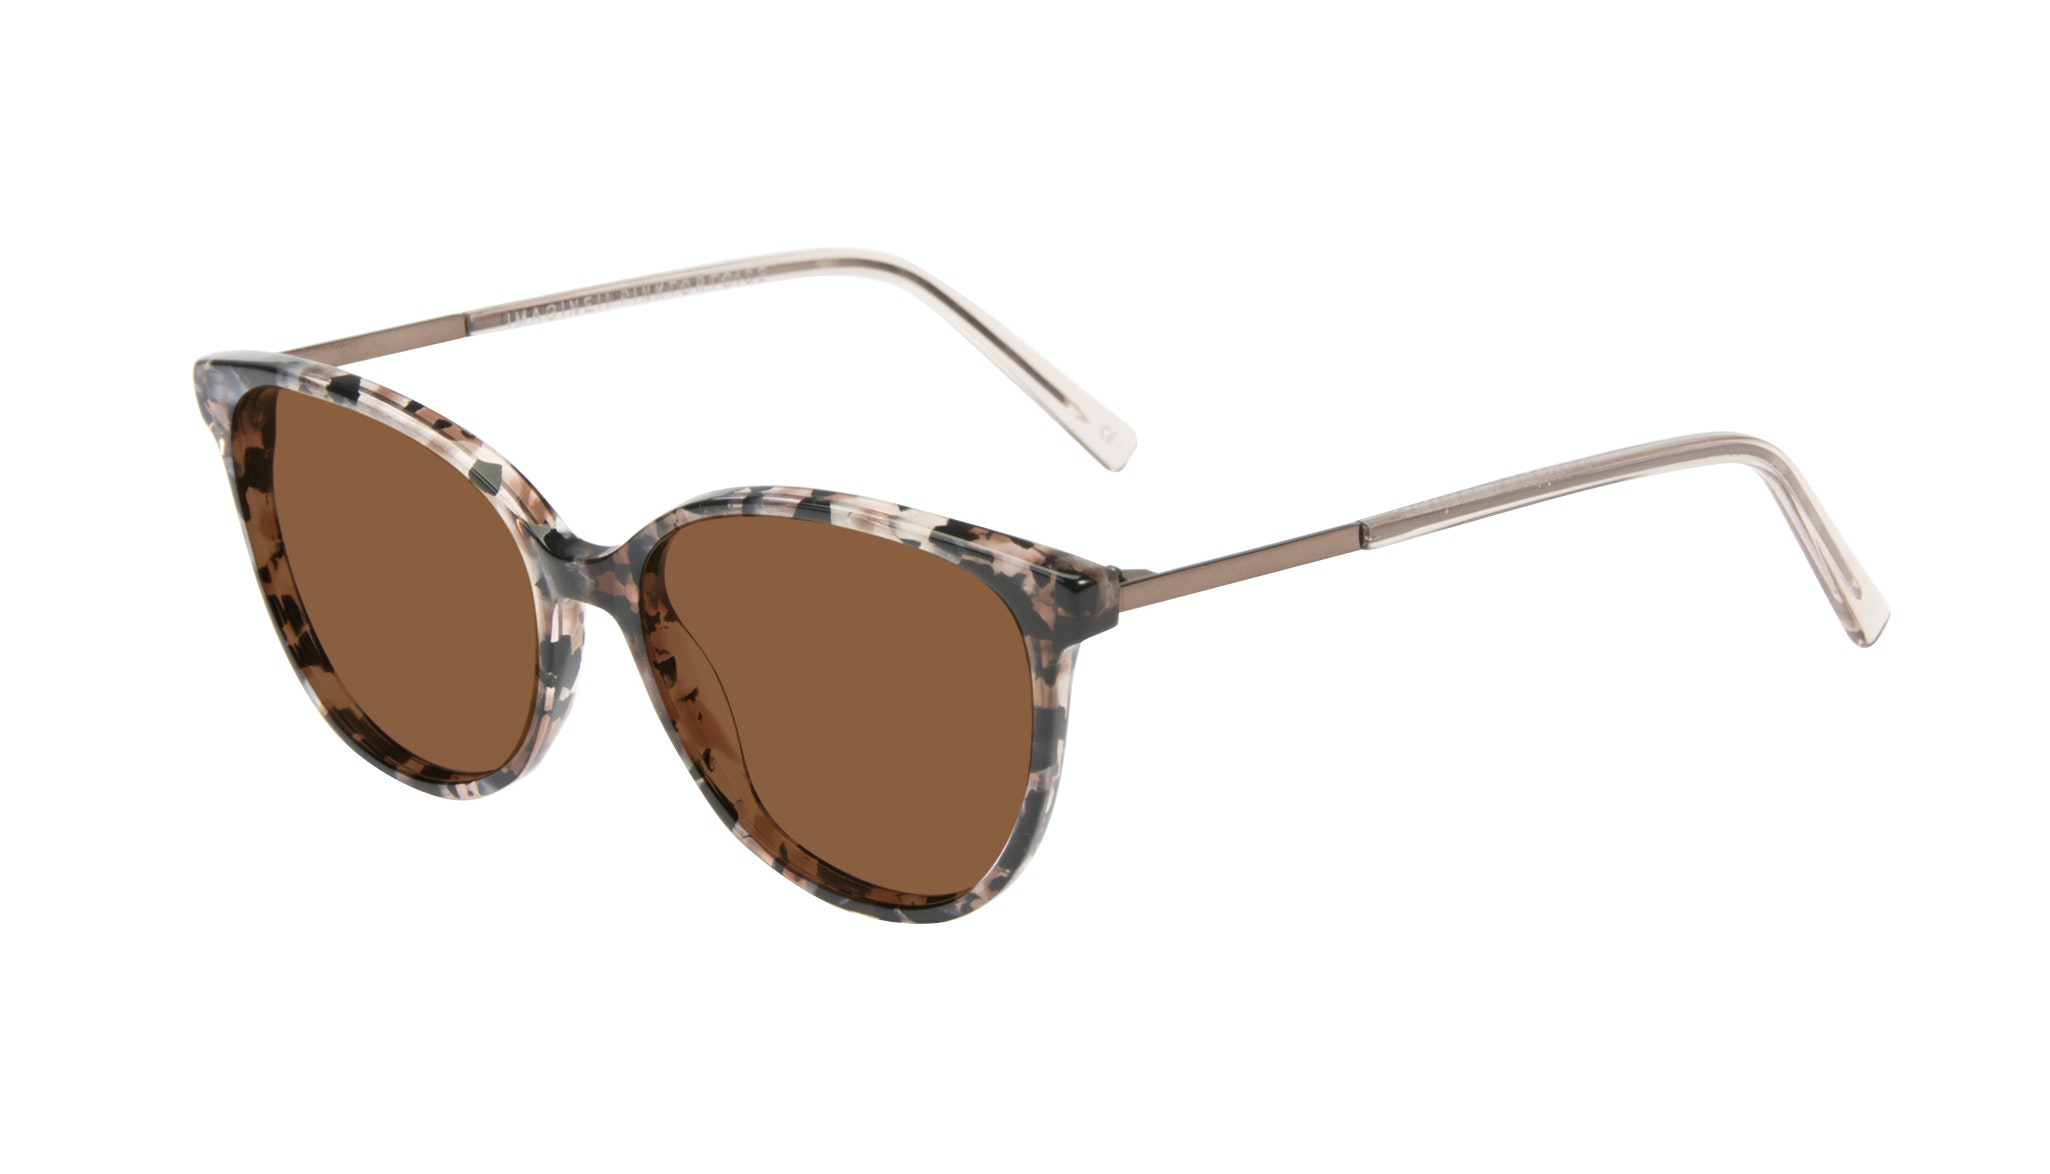 Affordable Fashion Glasses Cat Eye Sunglasses Women Imagine II Pink Tortoise Tilt